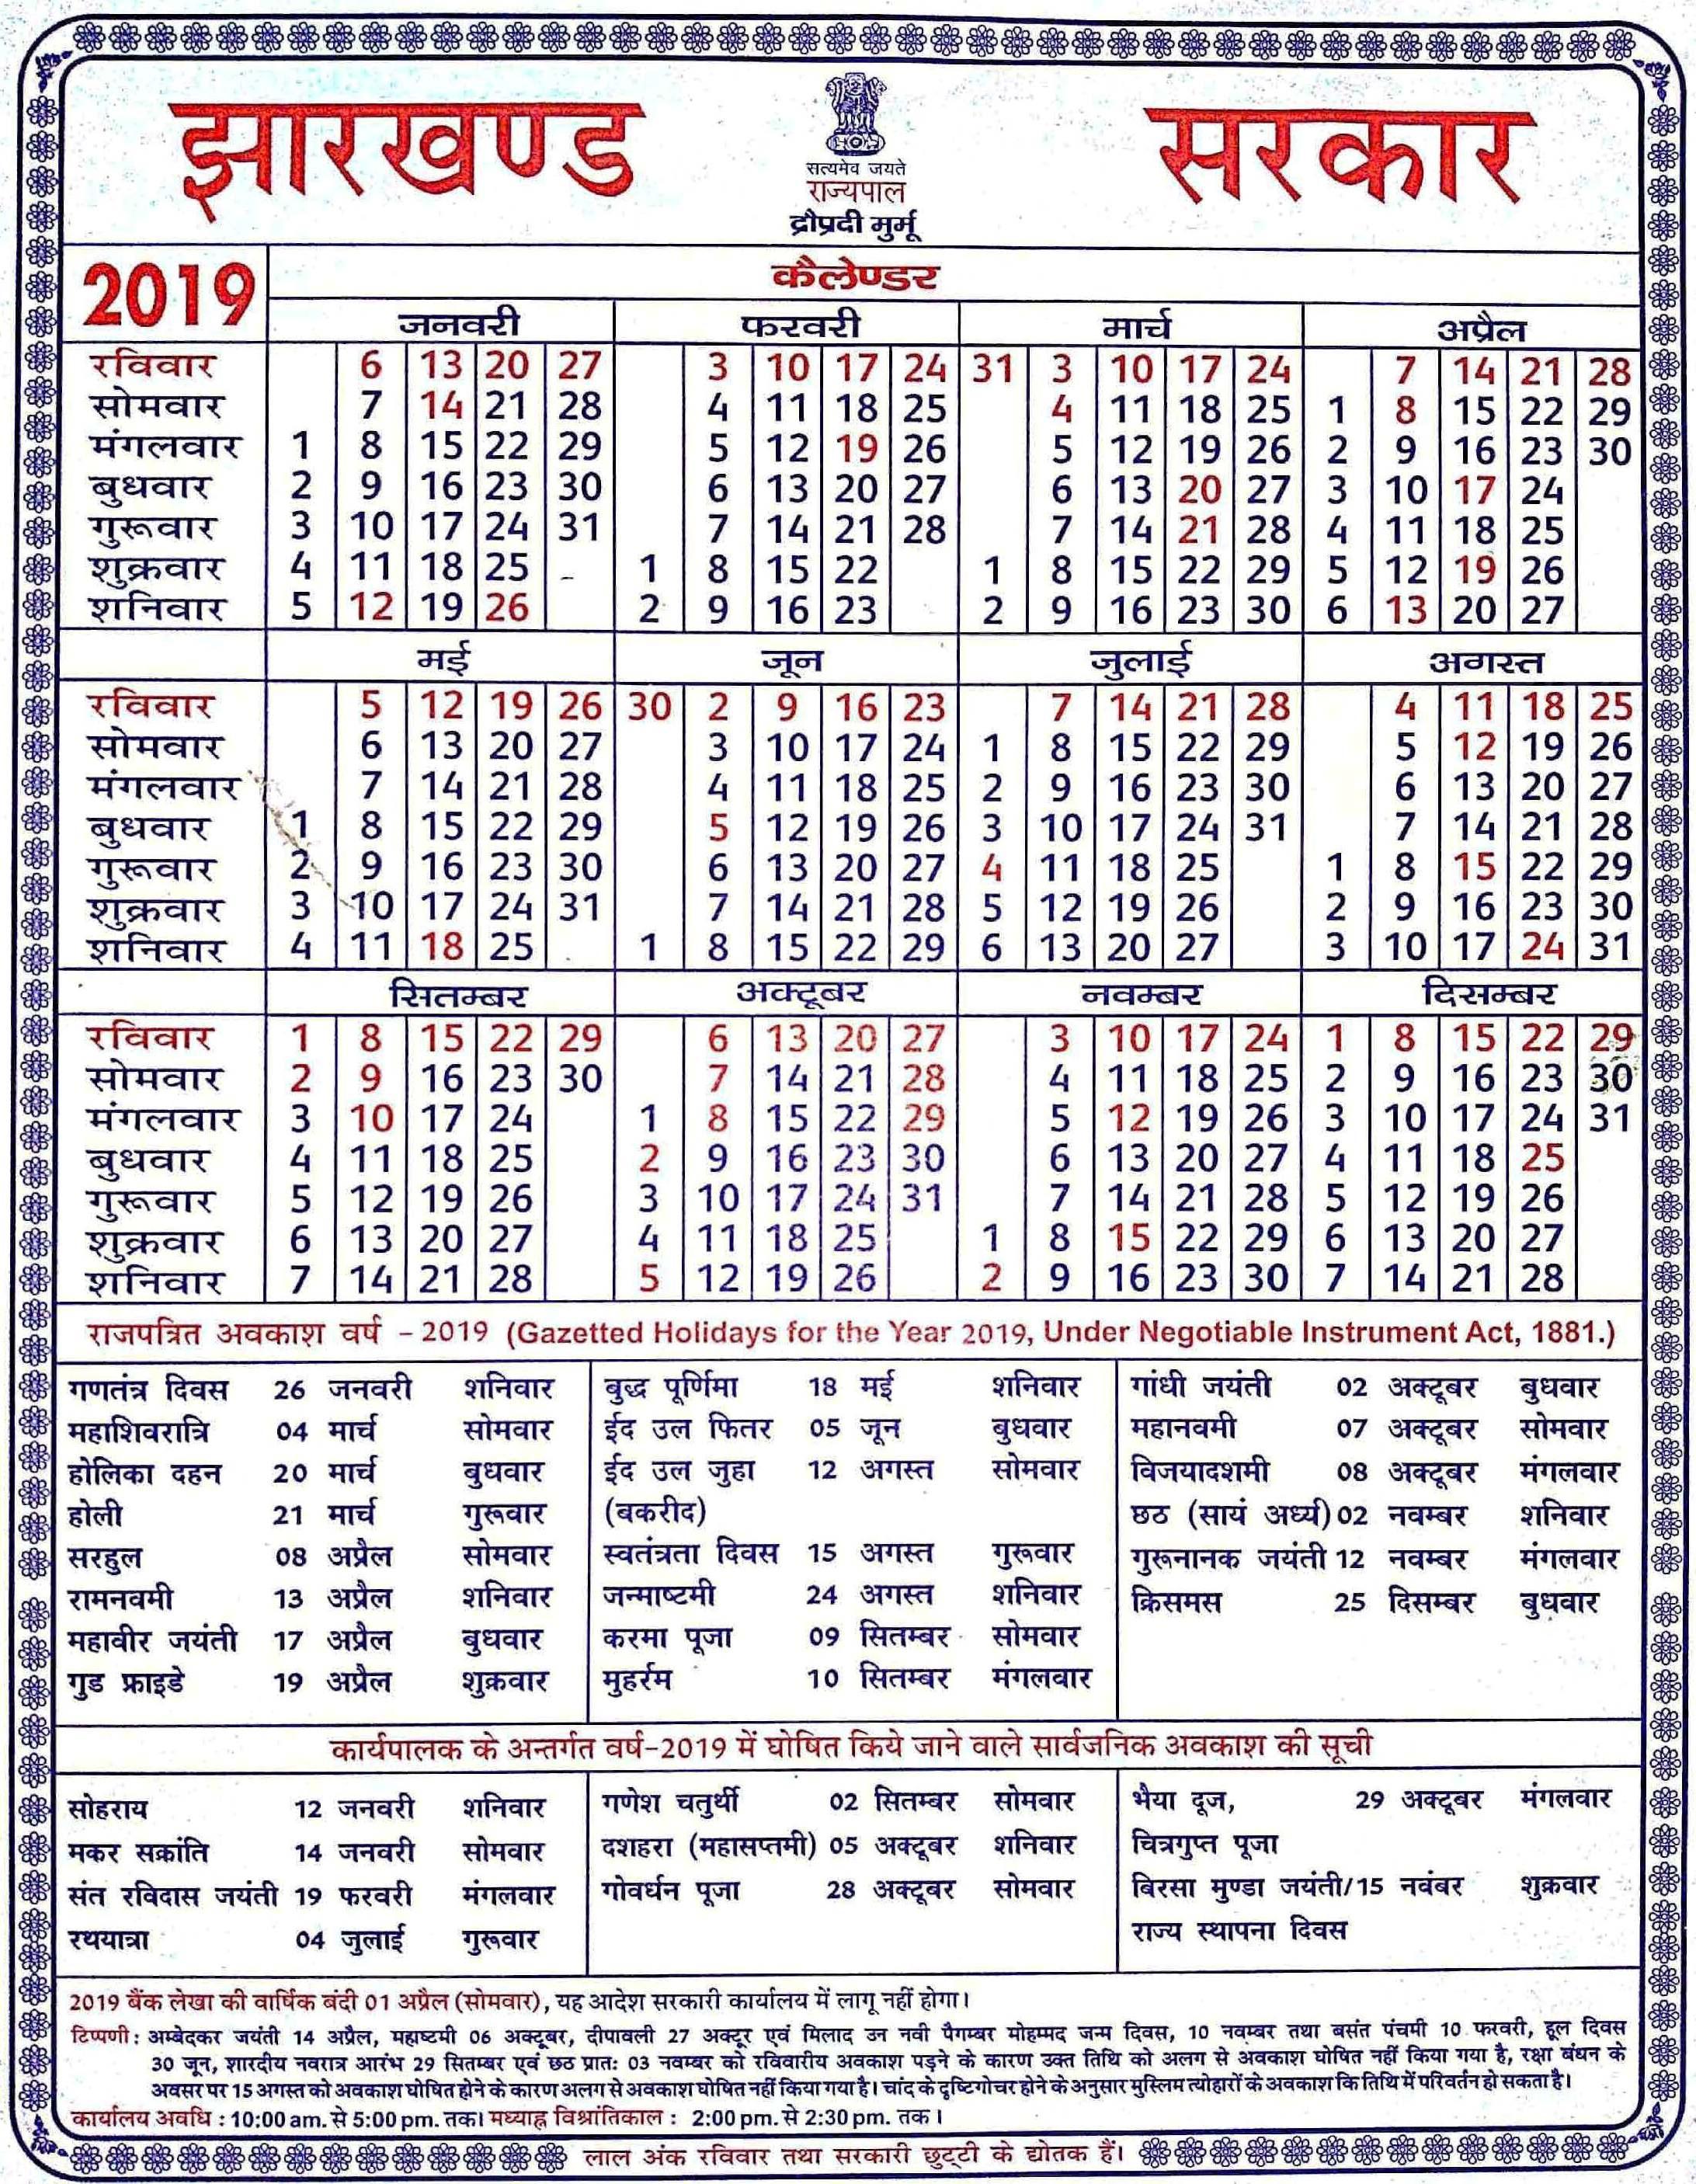 District Giridih, Government Of Jharkhand | City Of Hills throughout Bihar Govt Calendar 2020 Pdf